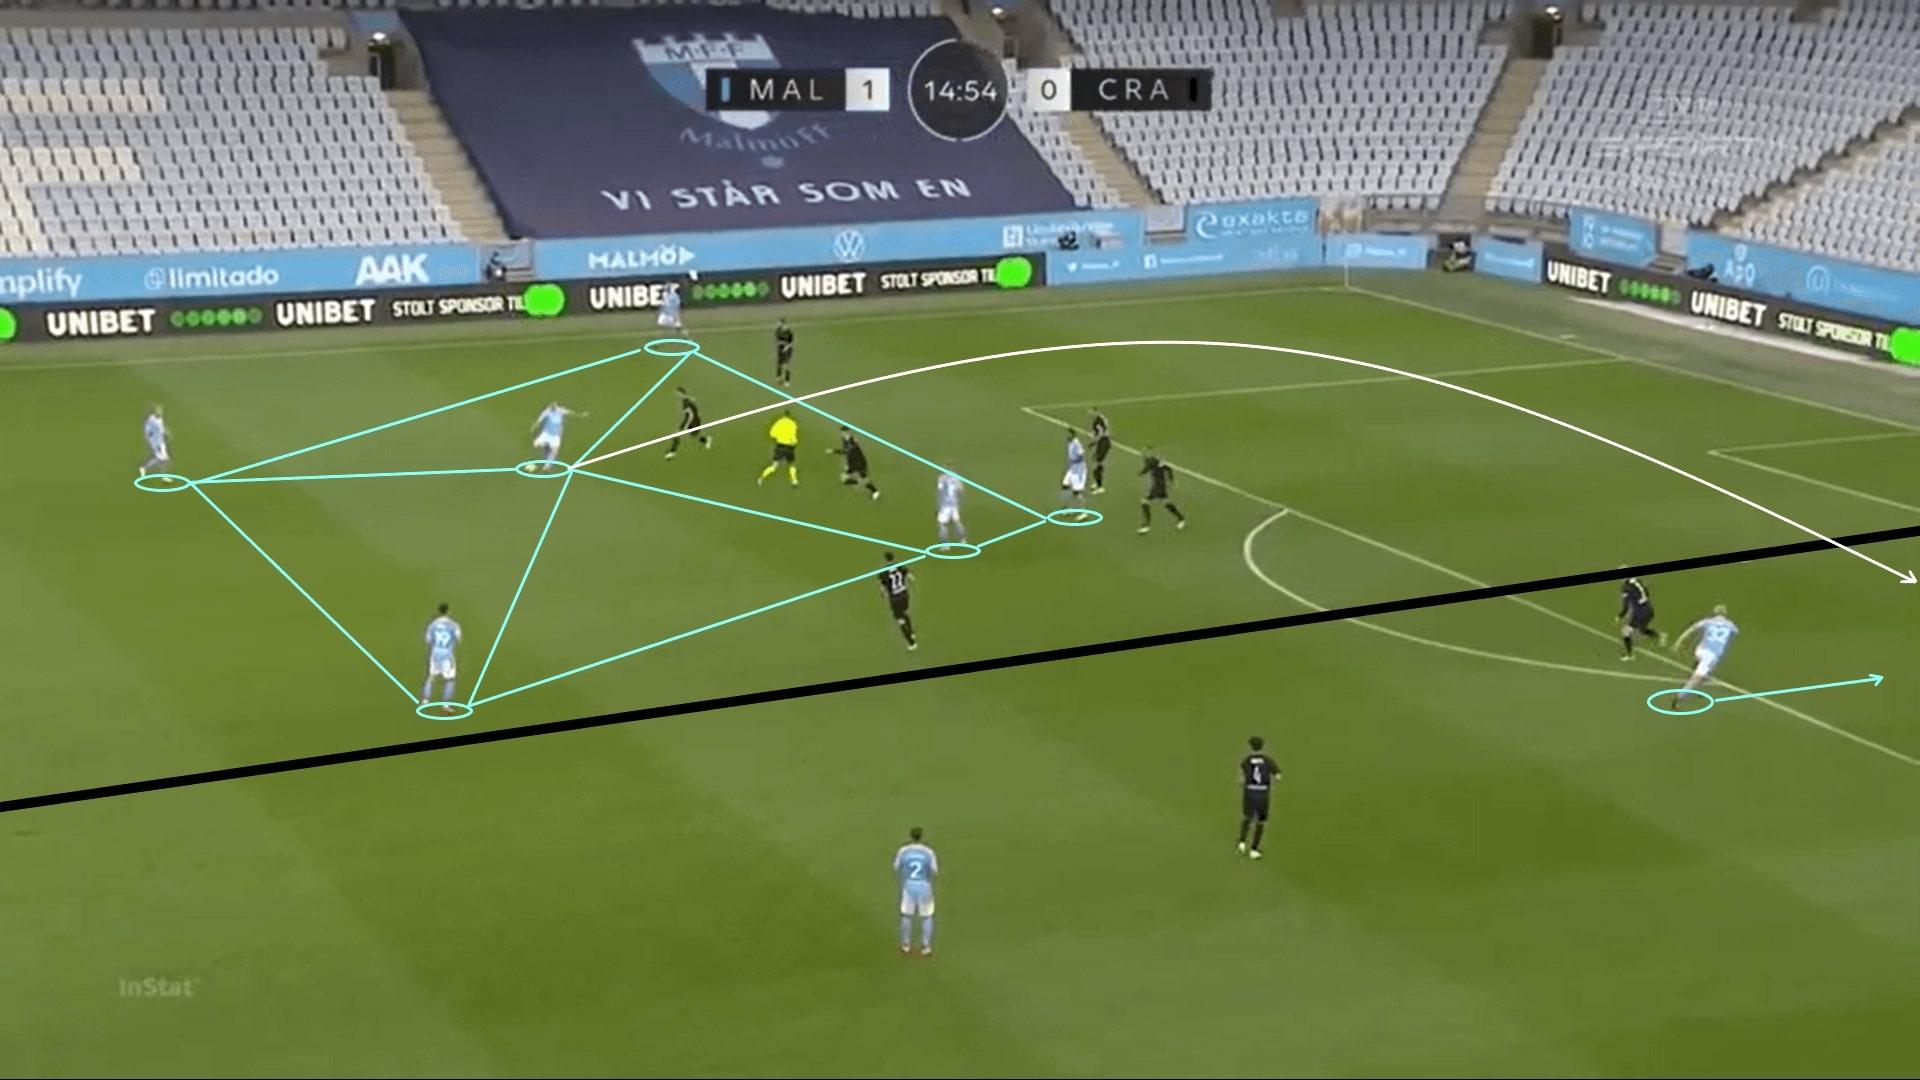 UEFA Europa League Qualifying 2020/21: Malmo FF vs KS Cracovia - tactical analysis - tactics